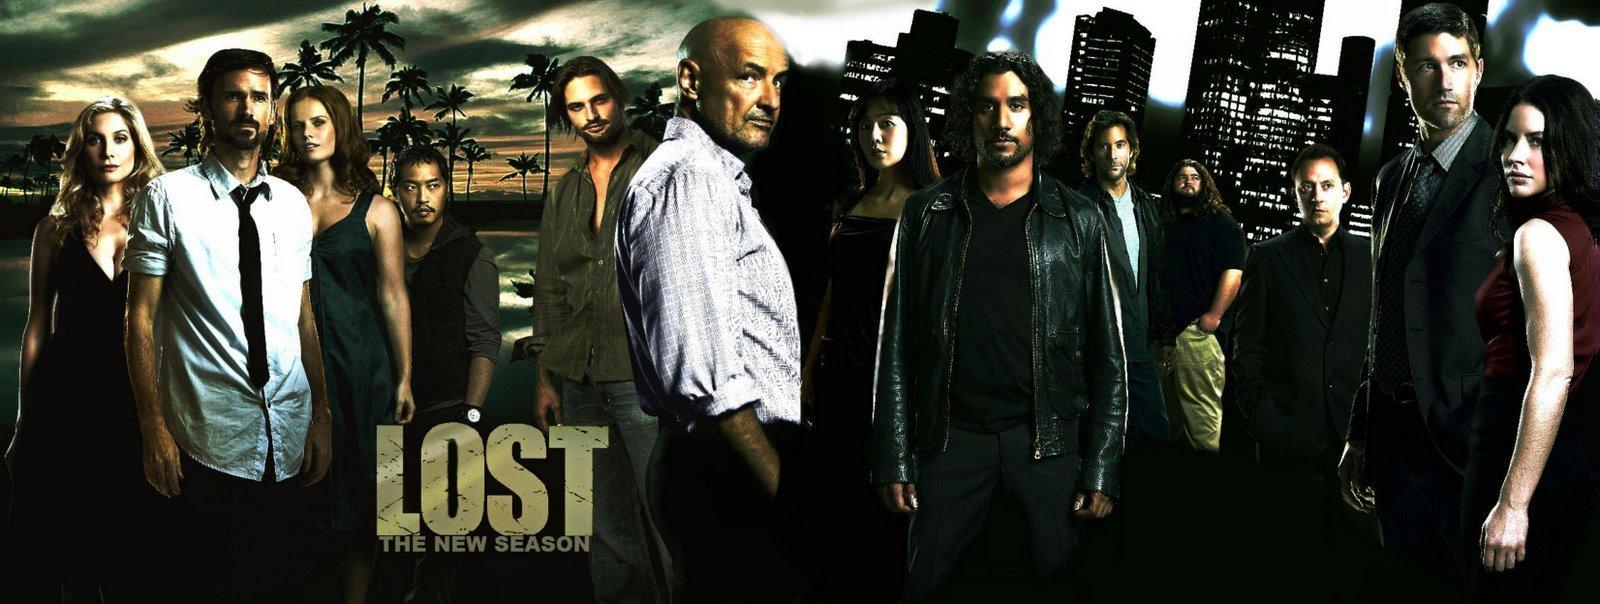 Trọn Bộ Mất Tích - Lost Season 1,2,3,4,5,6 (2004 - 2011)